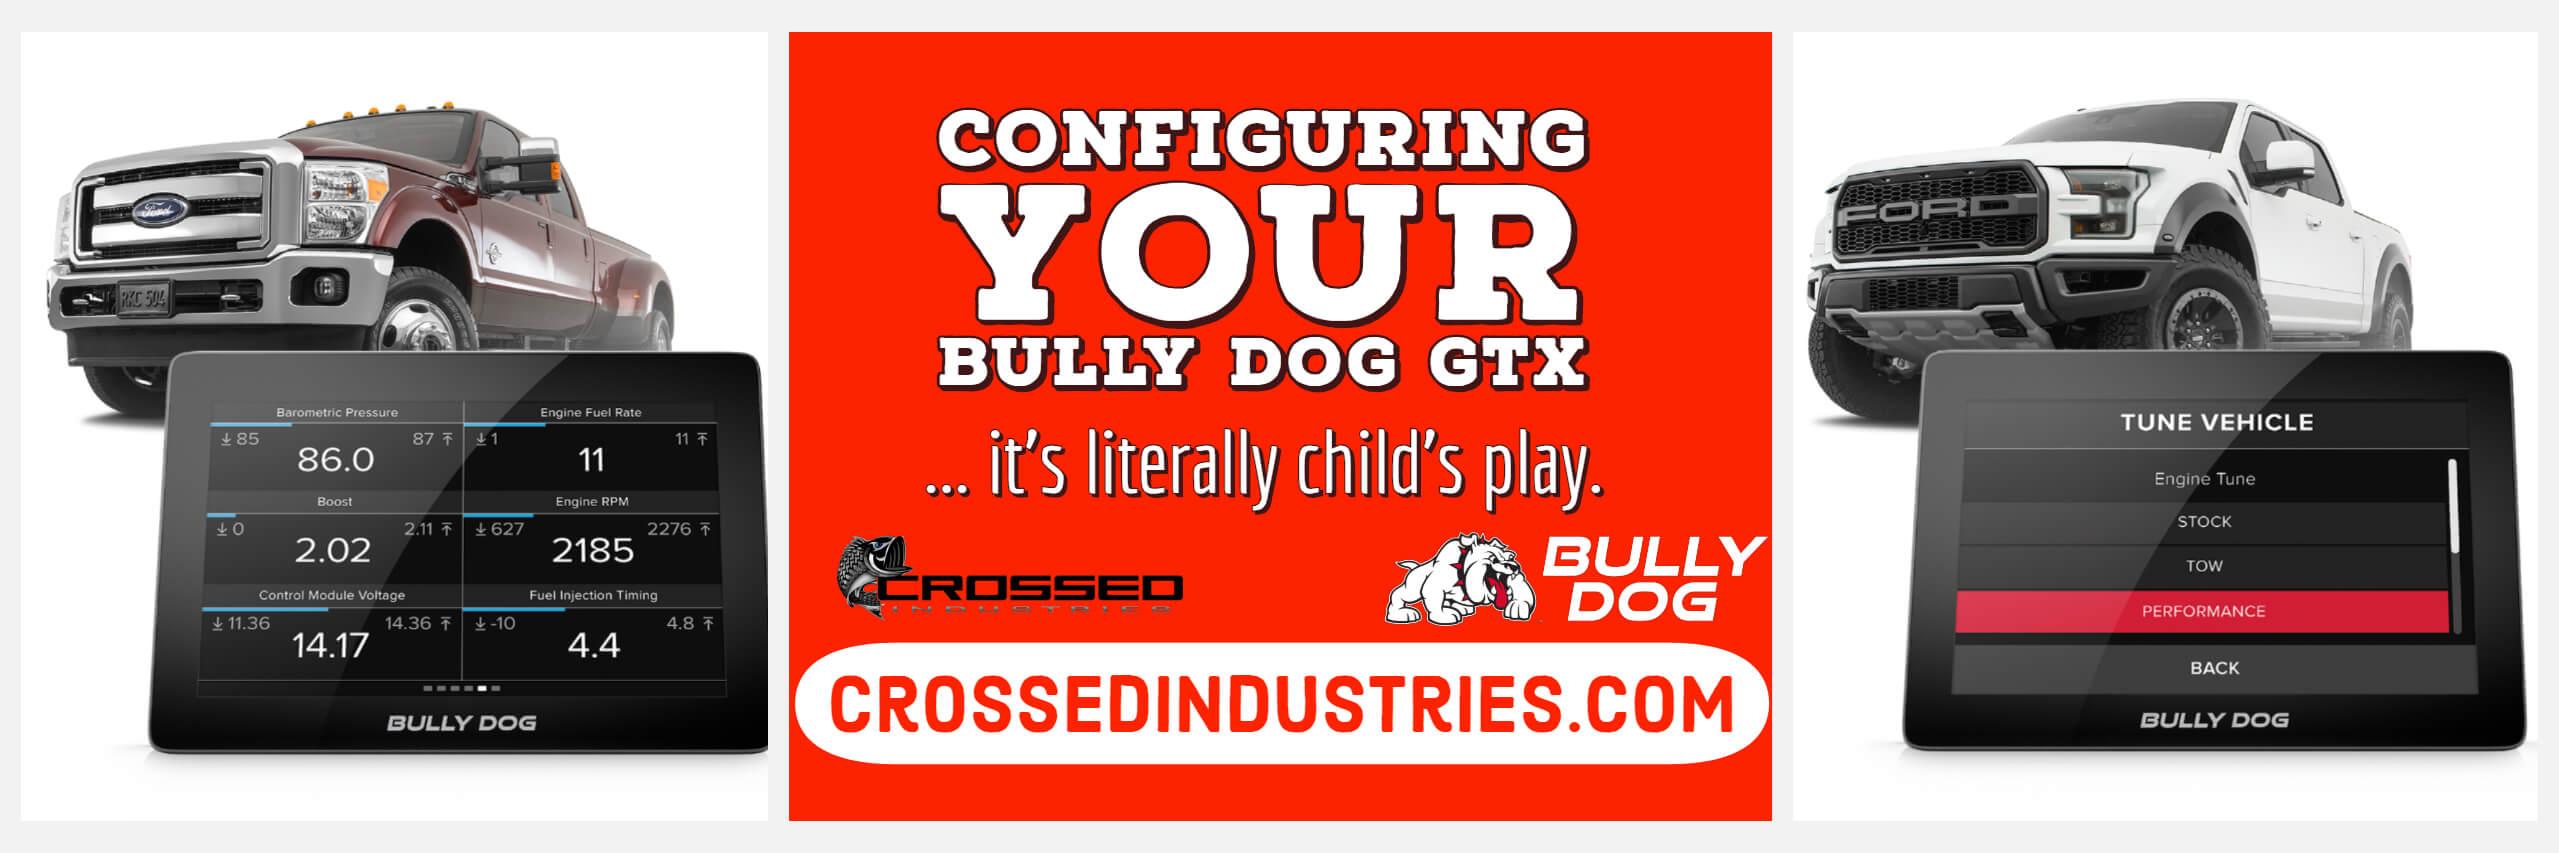 Configuring Your Bully Dog GTX - Bully Dog Banner